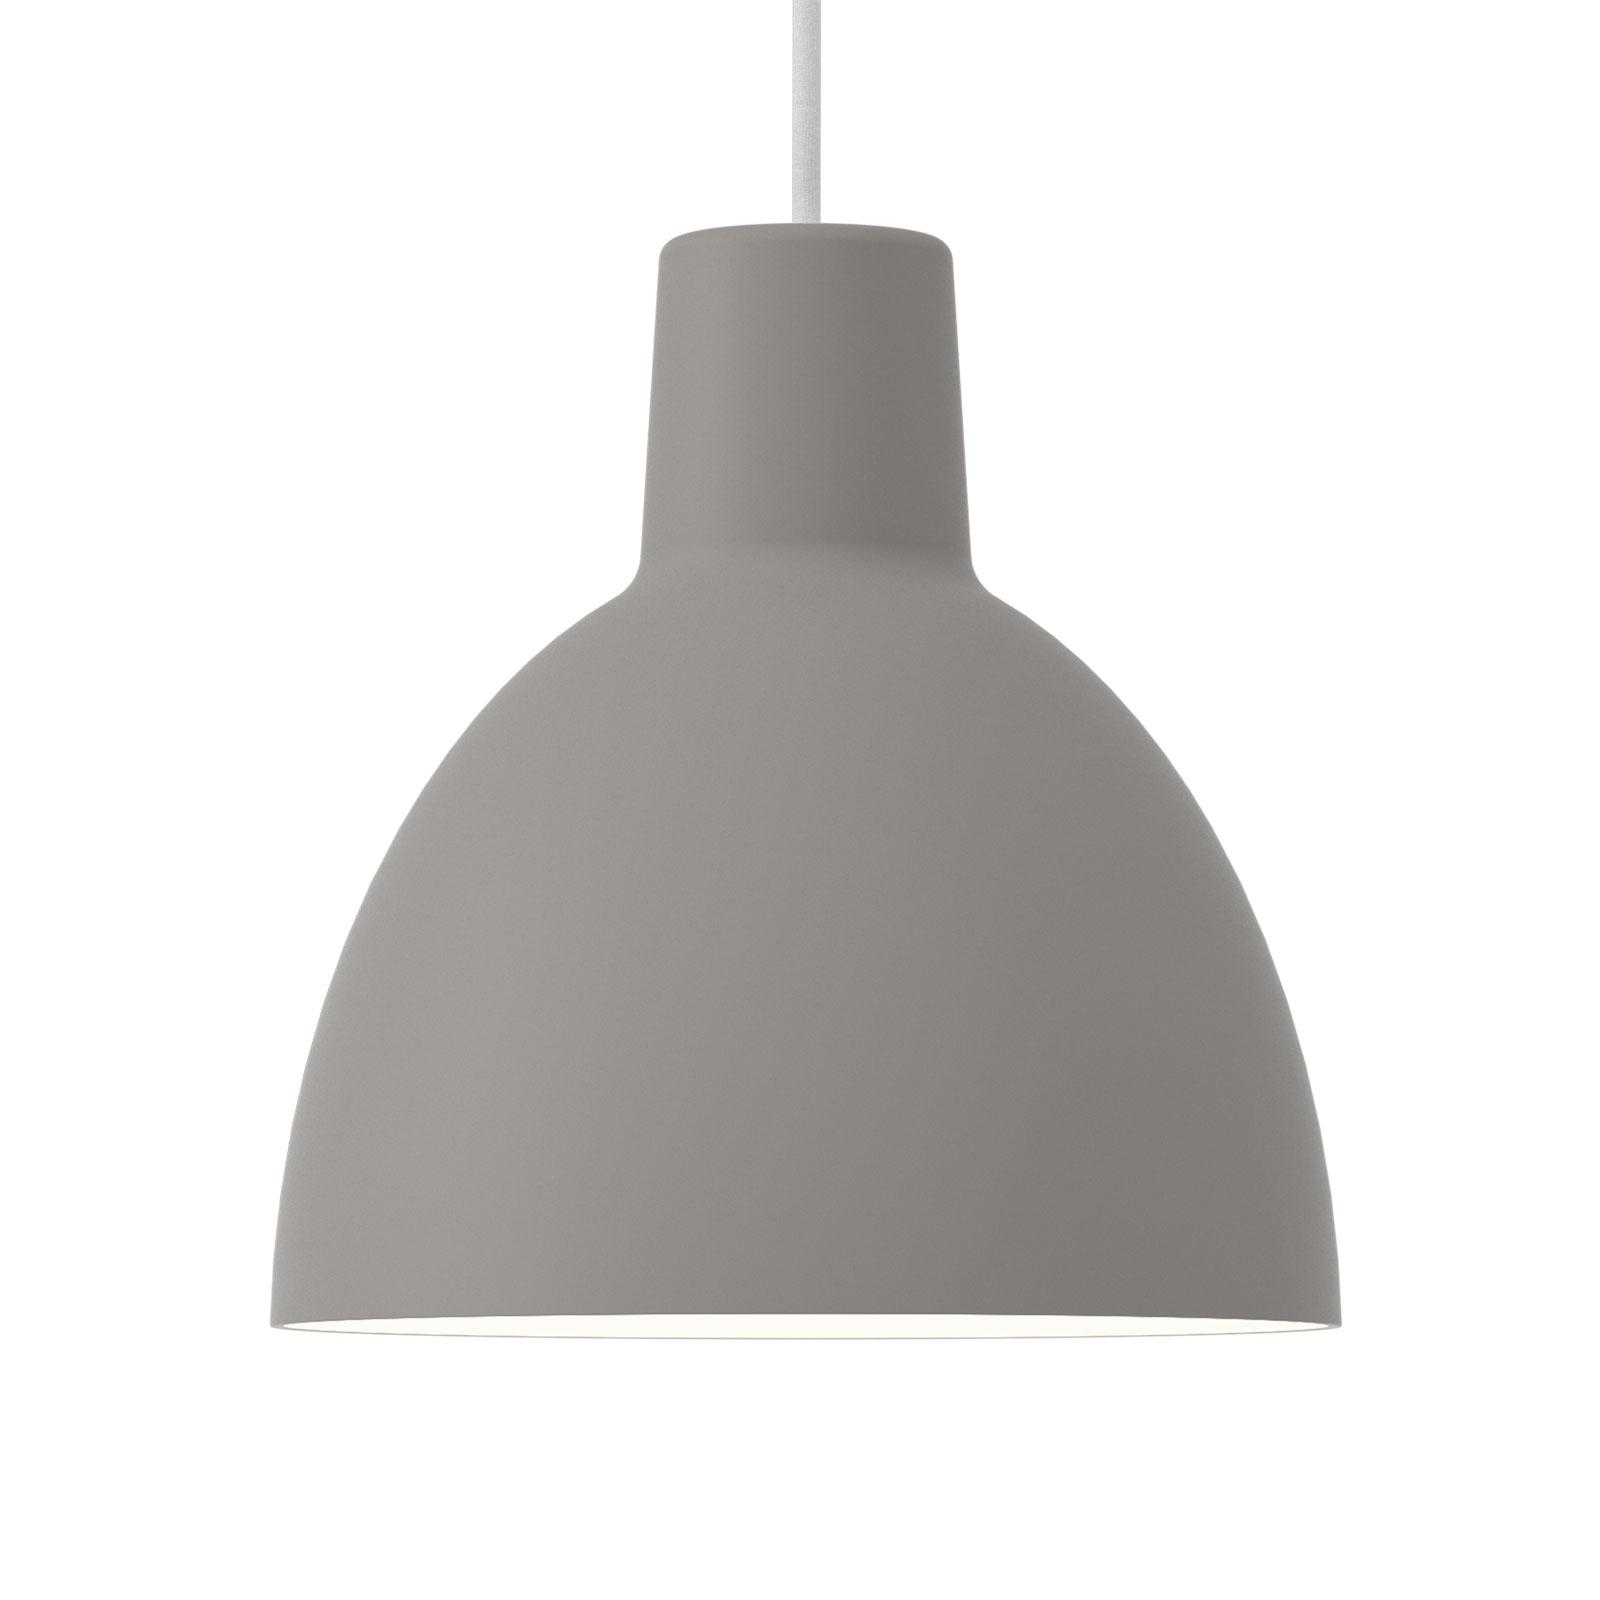 Louis Poulsen hanglamp Toldbod 250 lichtgrijs